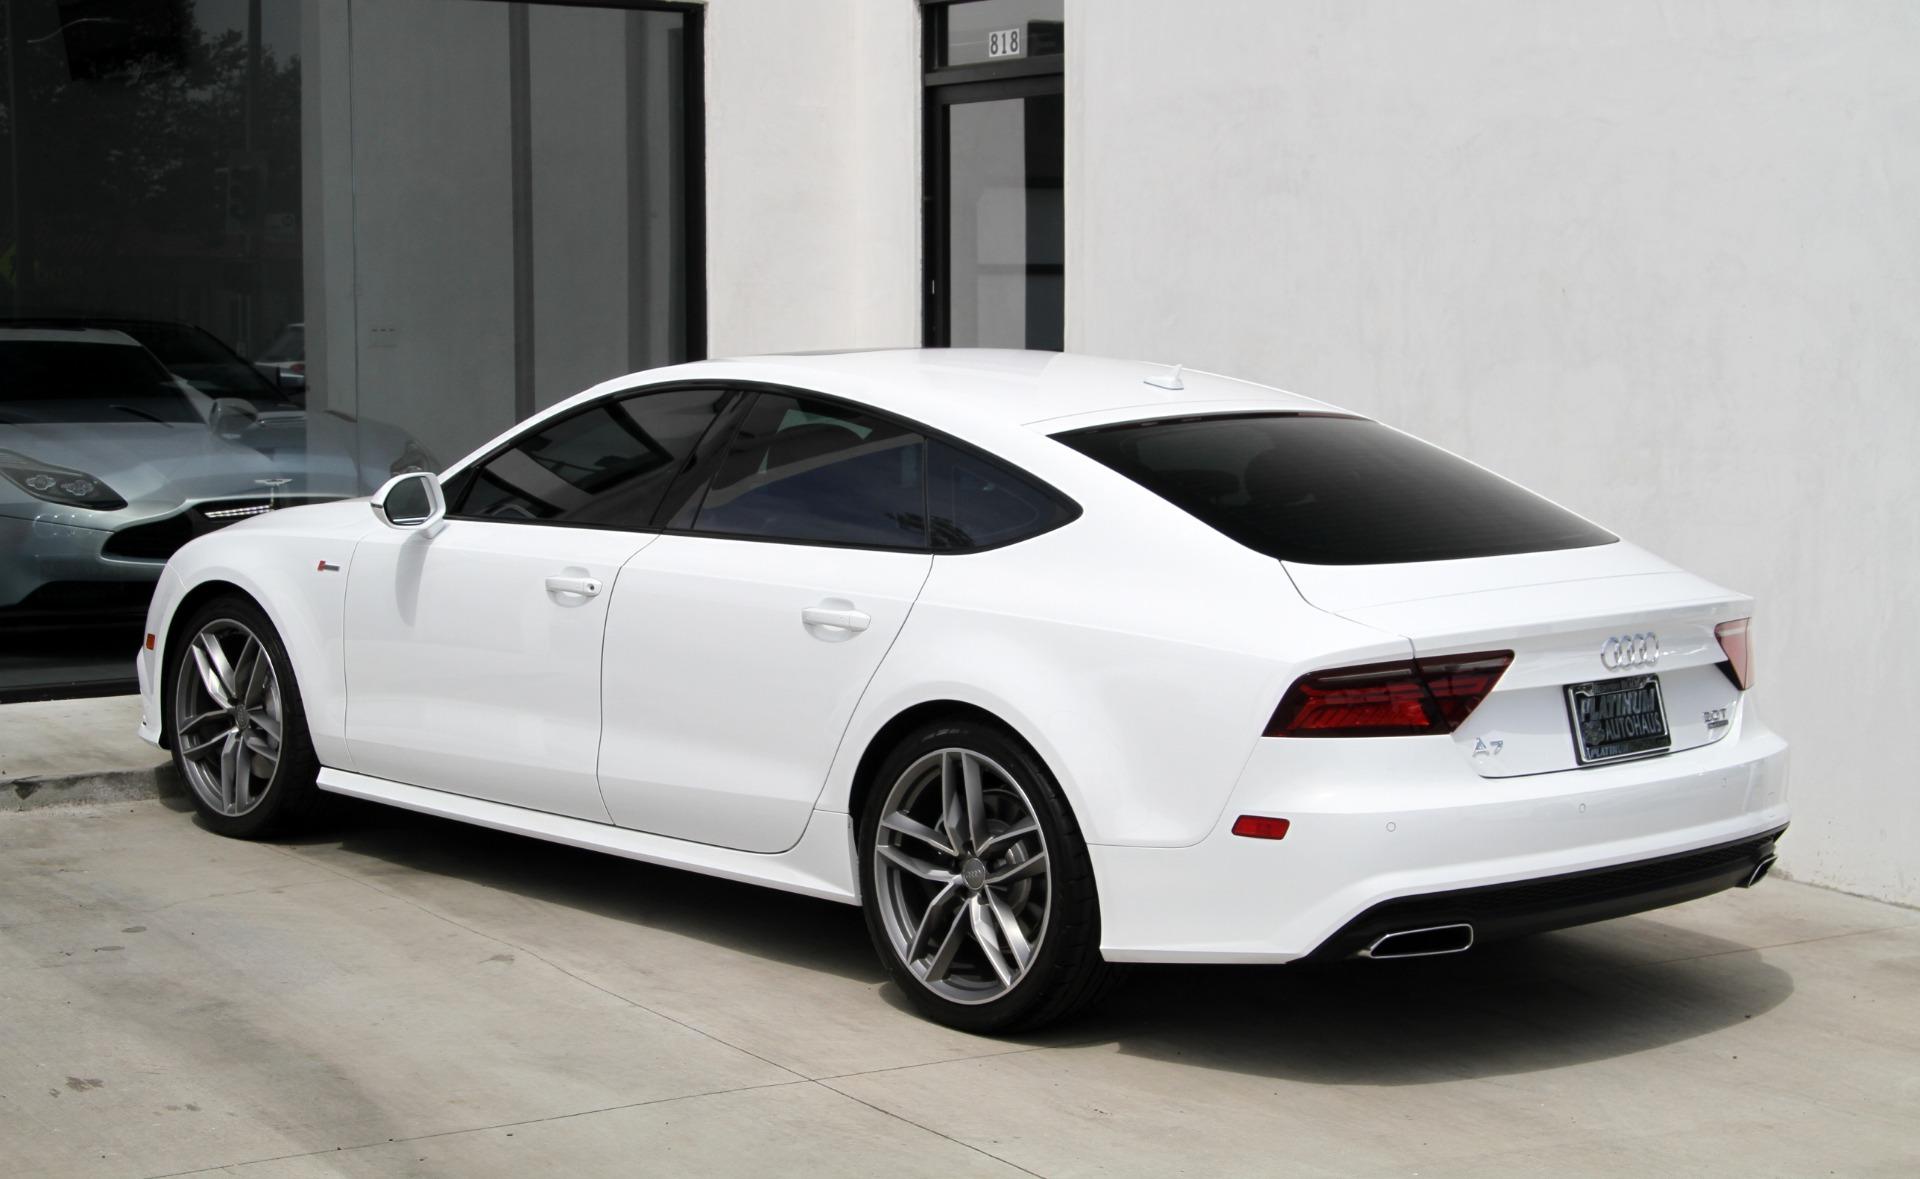 2016 Audi A7 3.0T quattro Premium Plus ***S LINE SPORT PKG *** Stock # 6219 for sale near Redondo Beach. CA | CA Audi Dealer